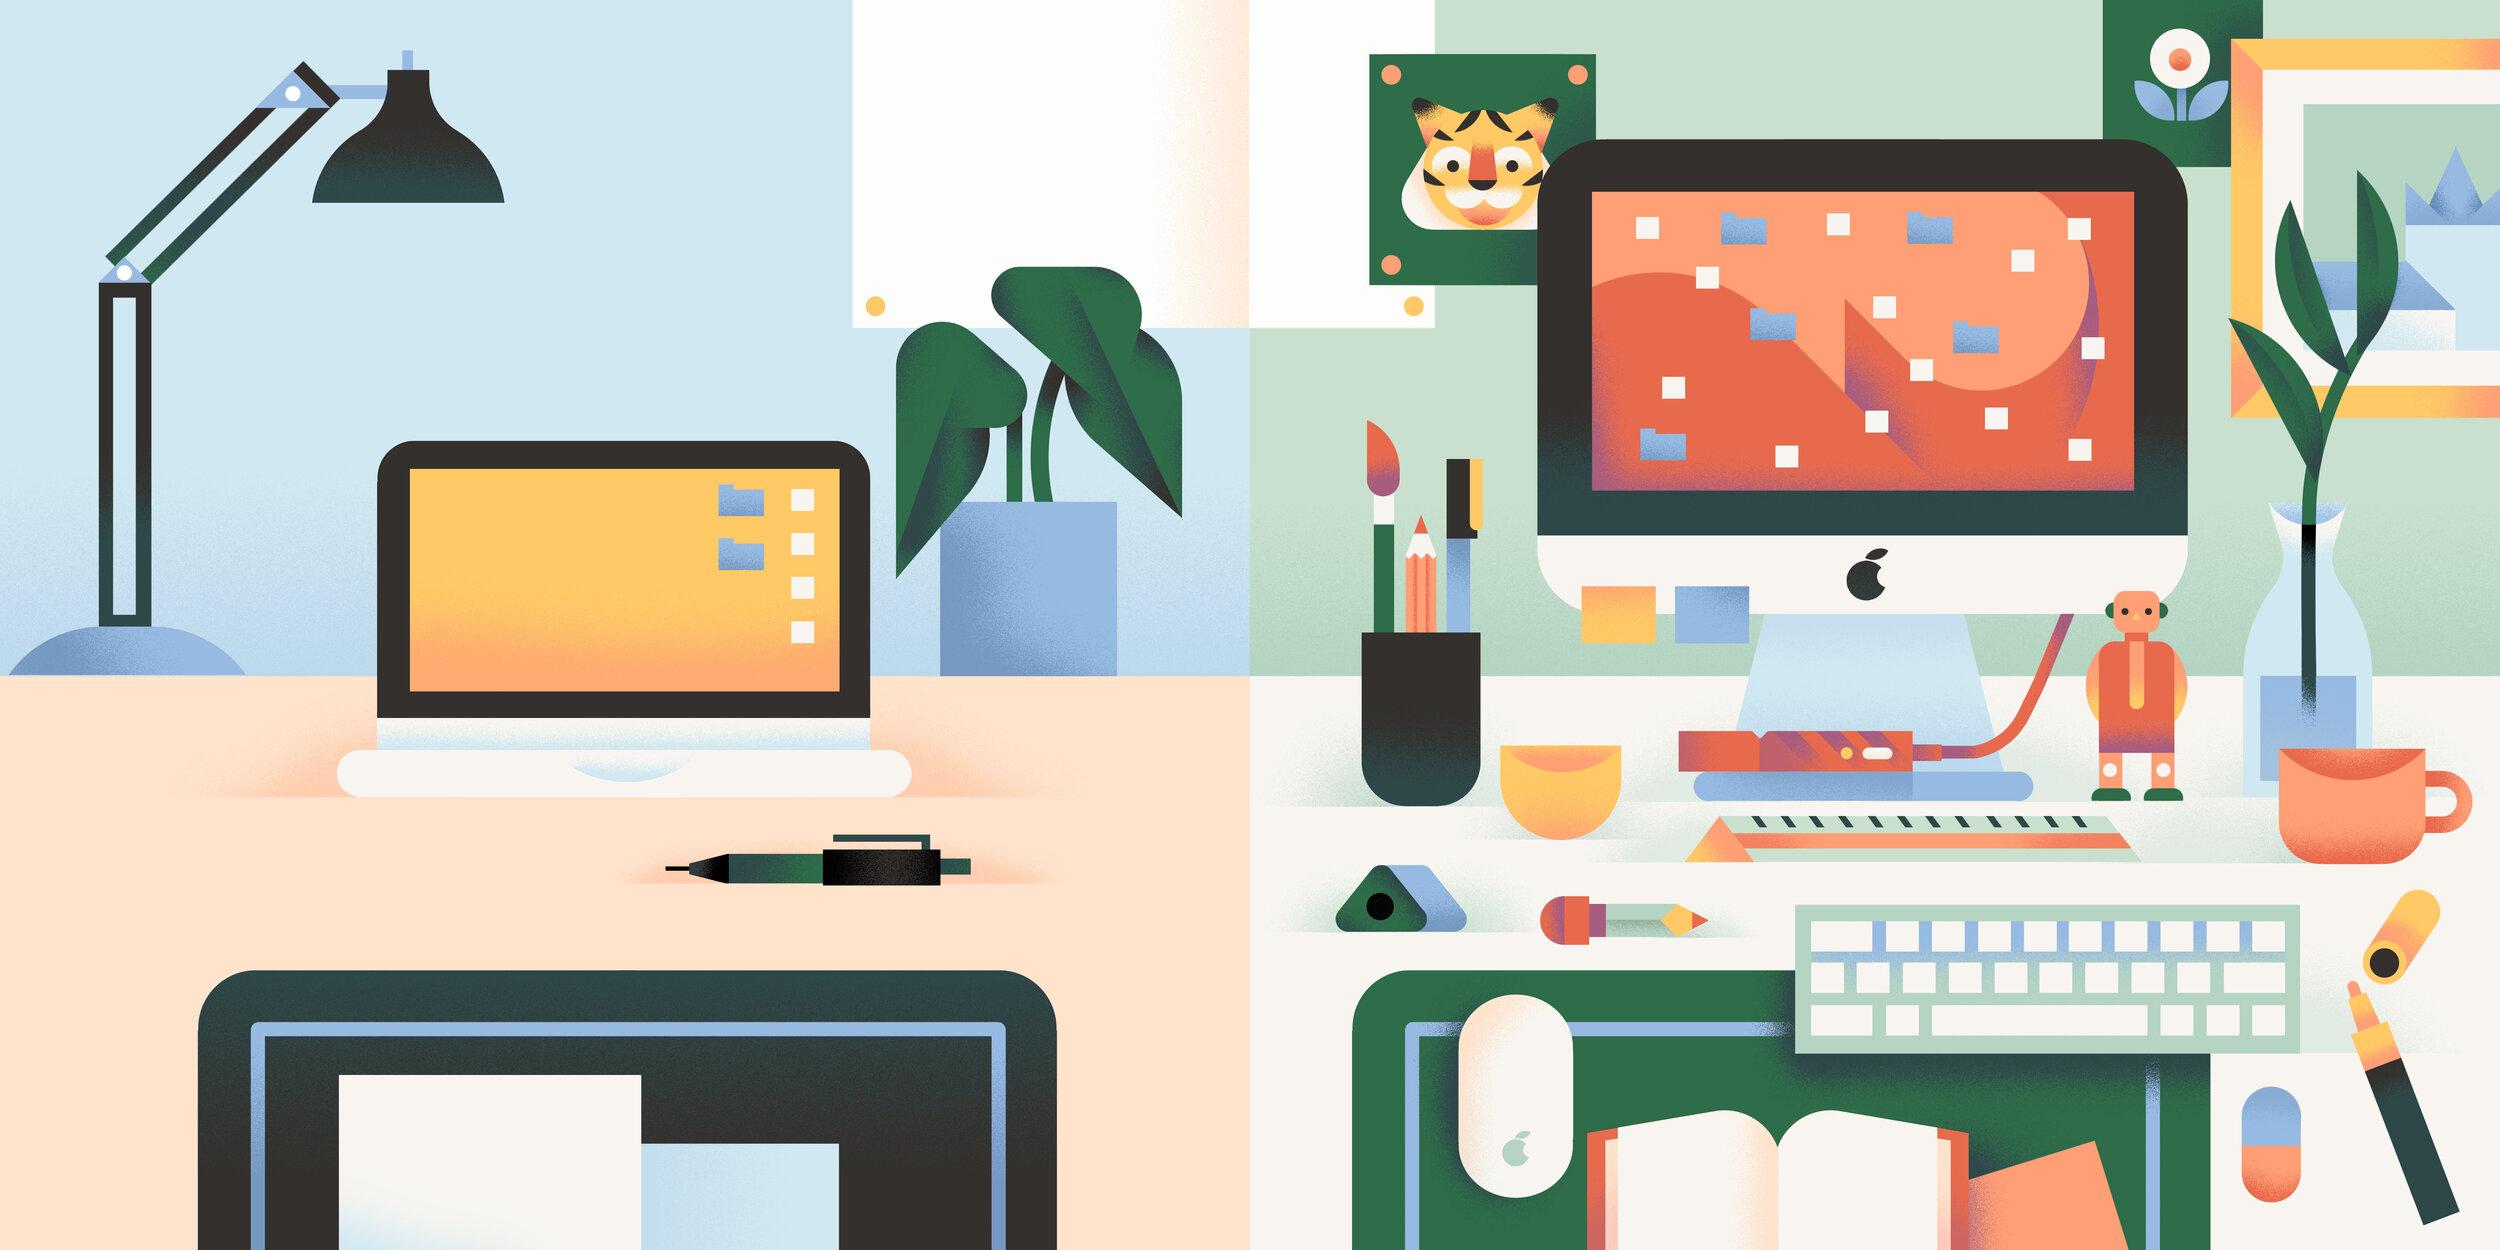 Living-with-a-designer-3_v2.jpg